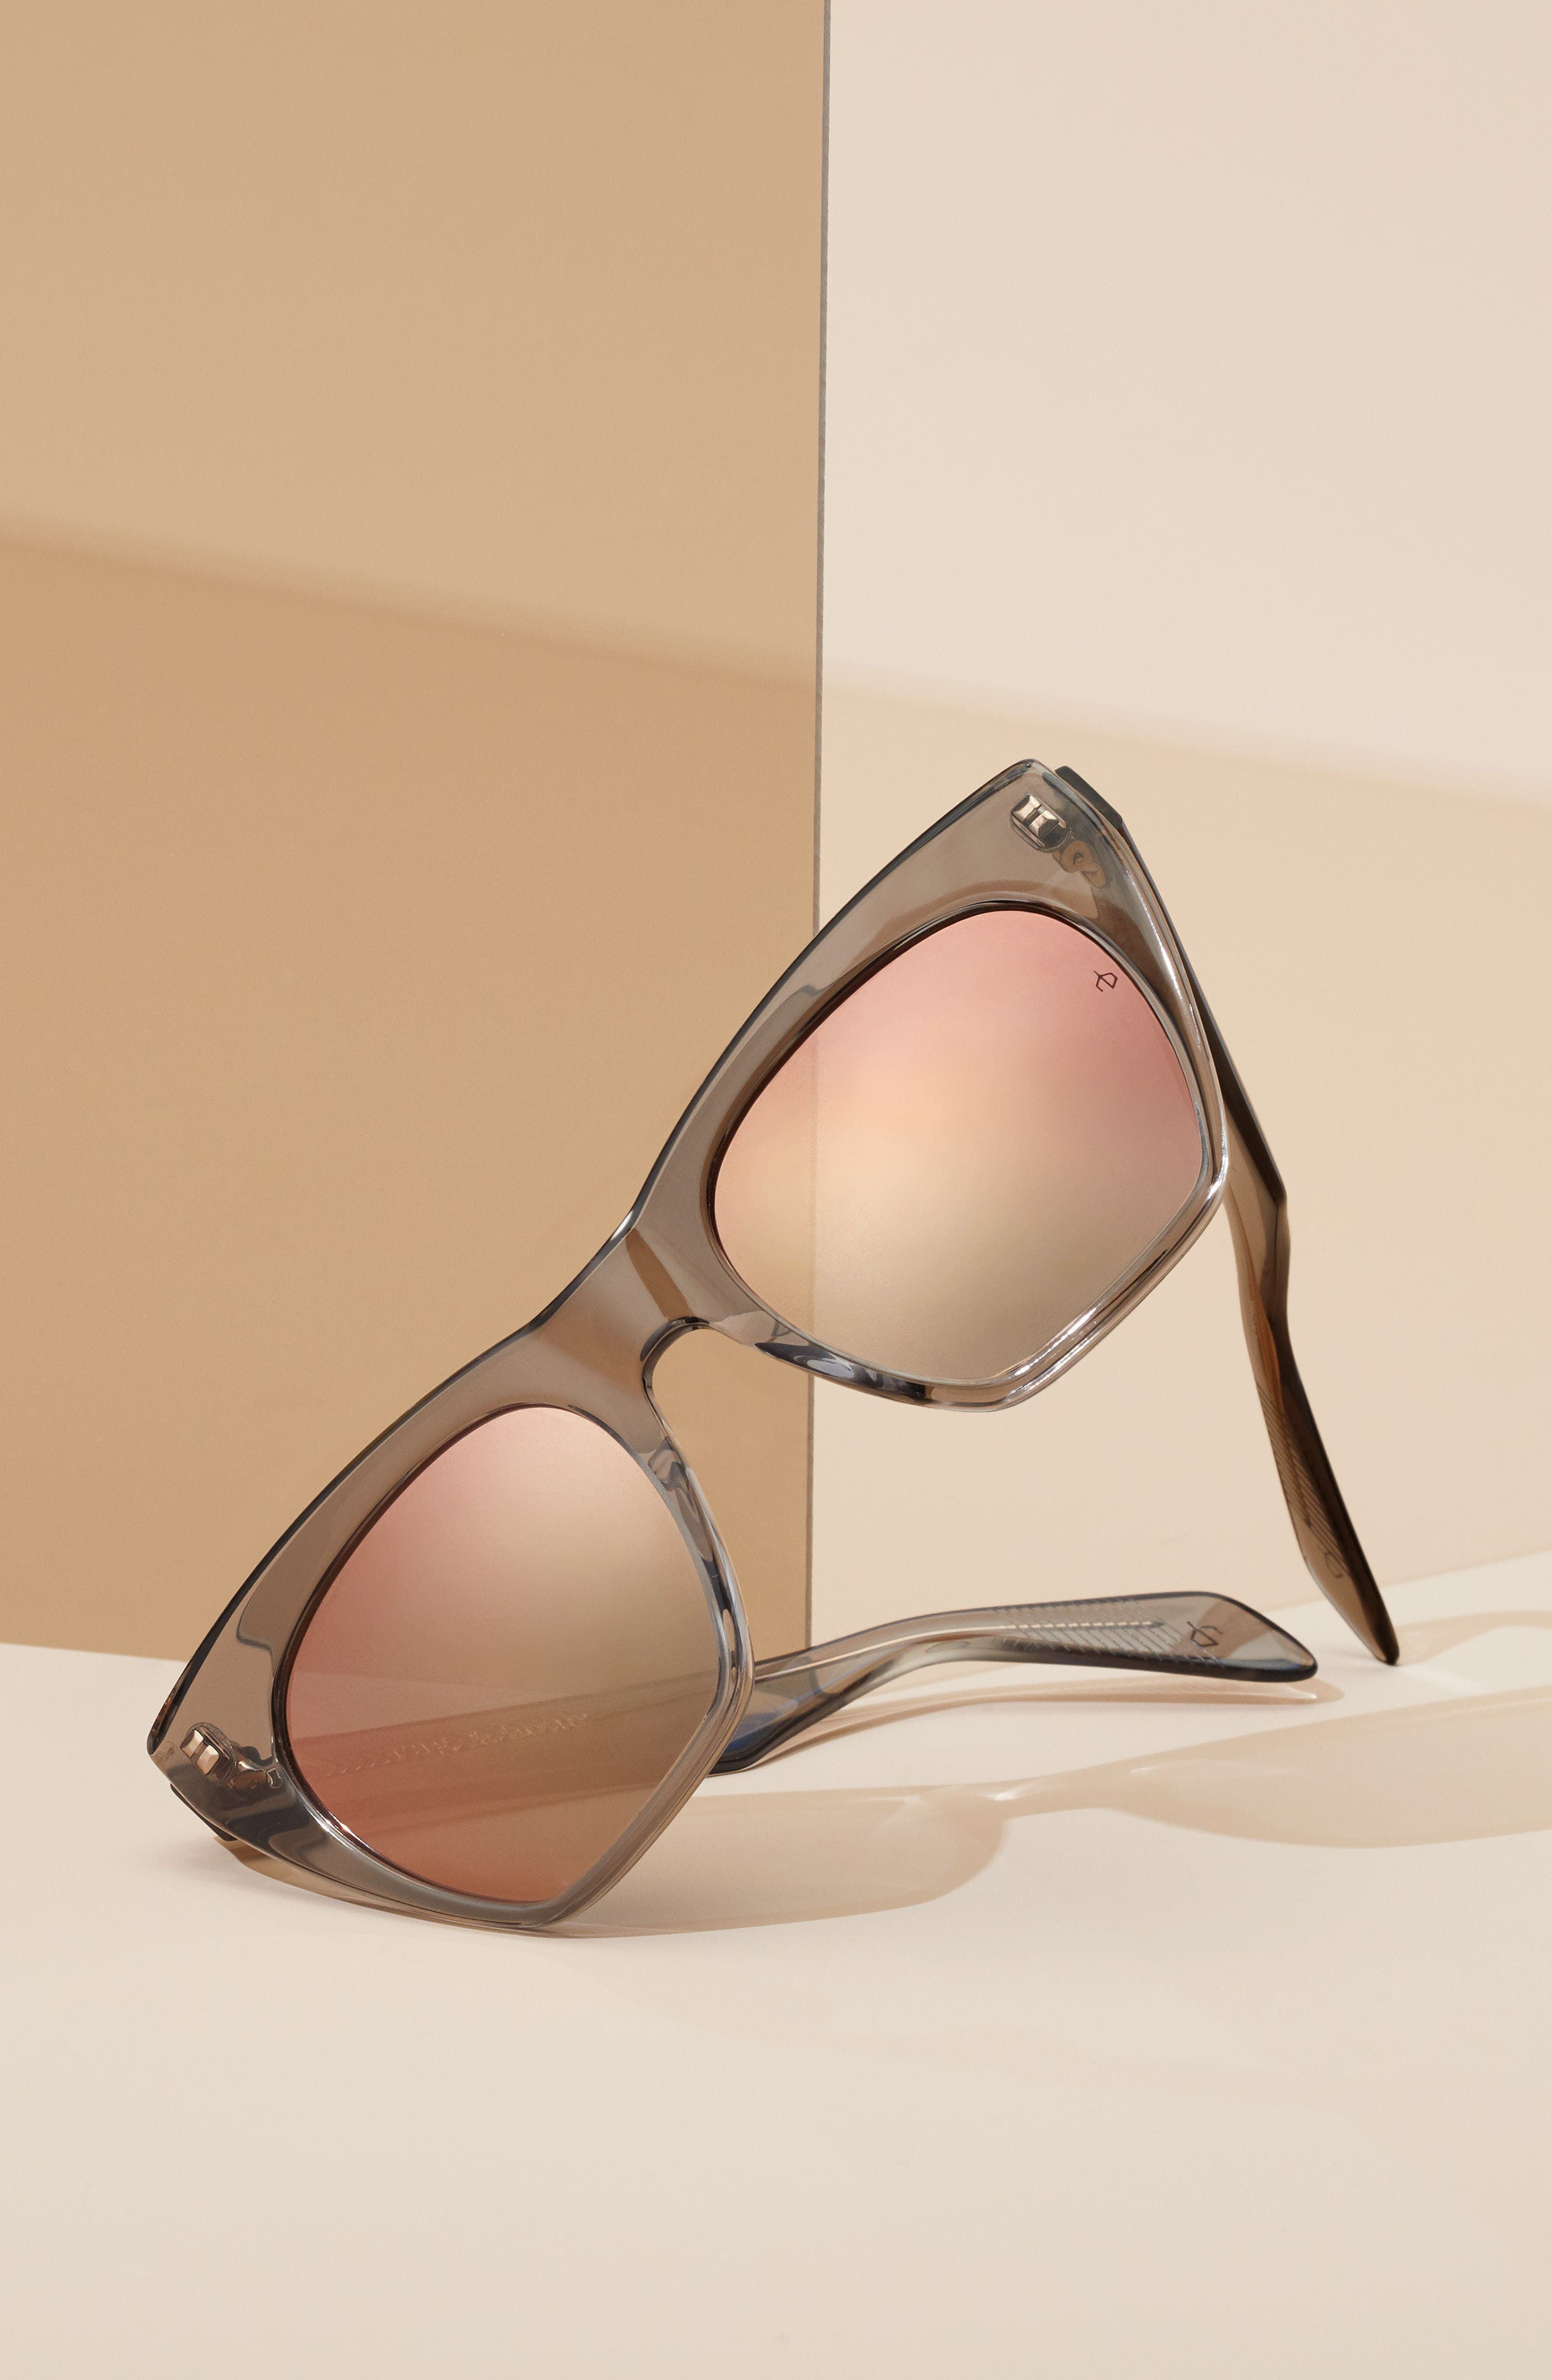 52mm Cat Eye Sunglasses,                             Alternate thumbnail 6, color,                             BLACK/ BLUE